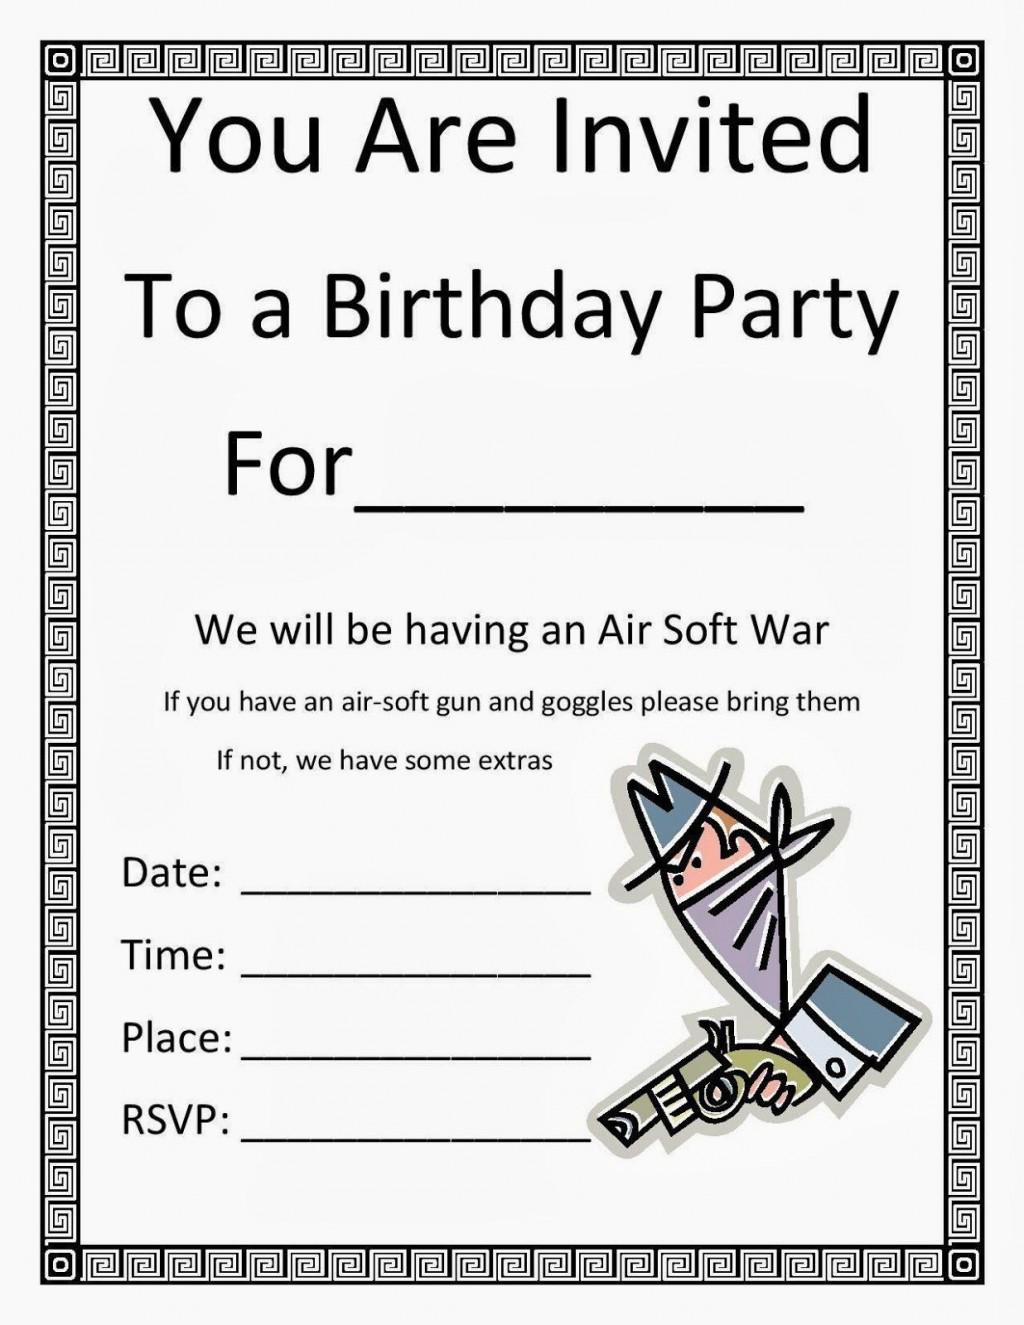 000 Imposing Party Invitation Template Word Idea  Dinner Summer Wording Sample Unicorn BirthdayLarge